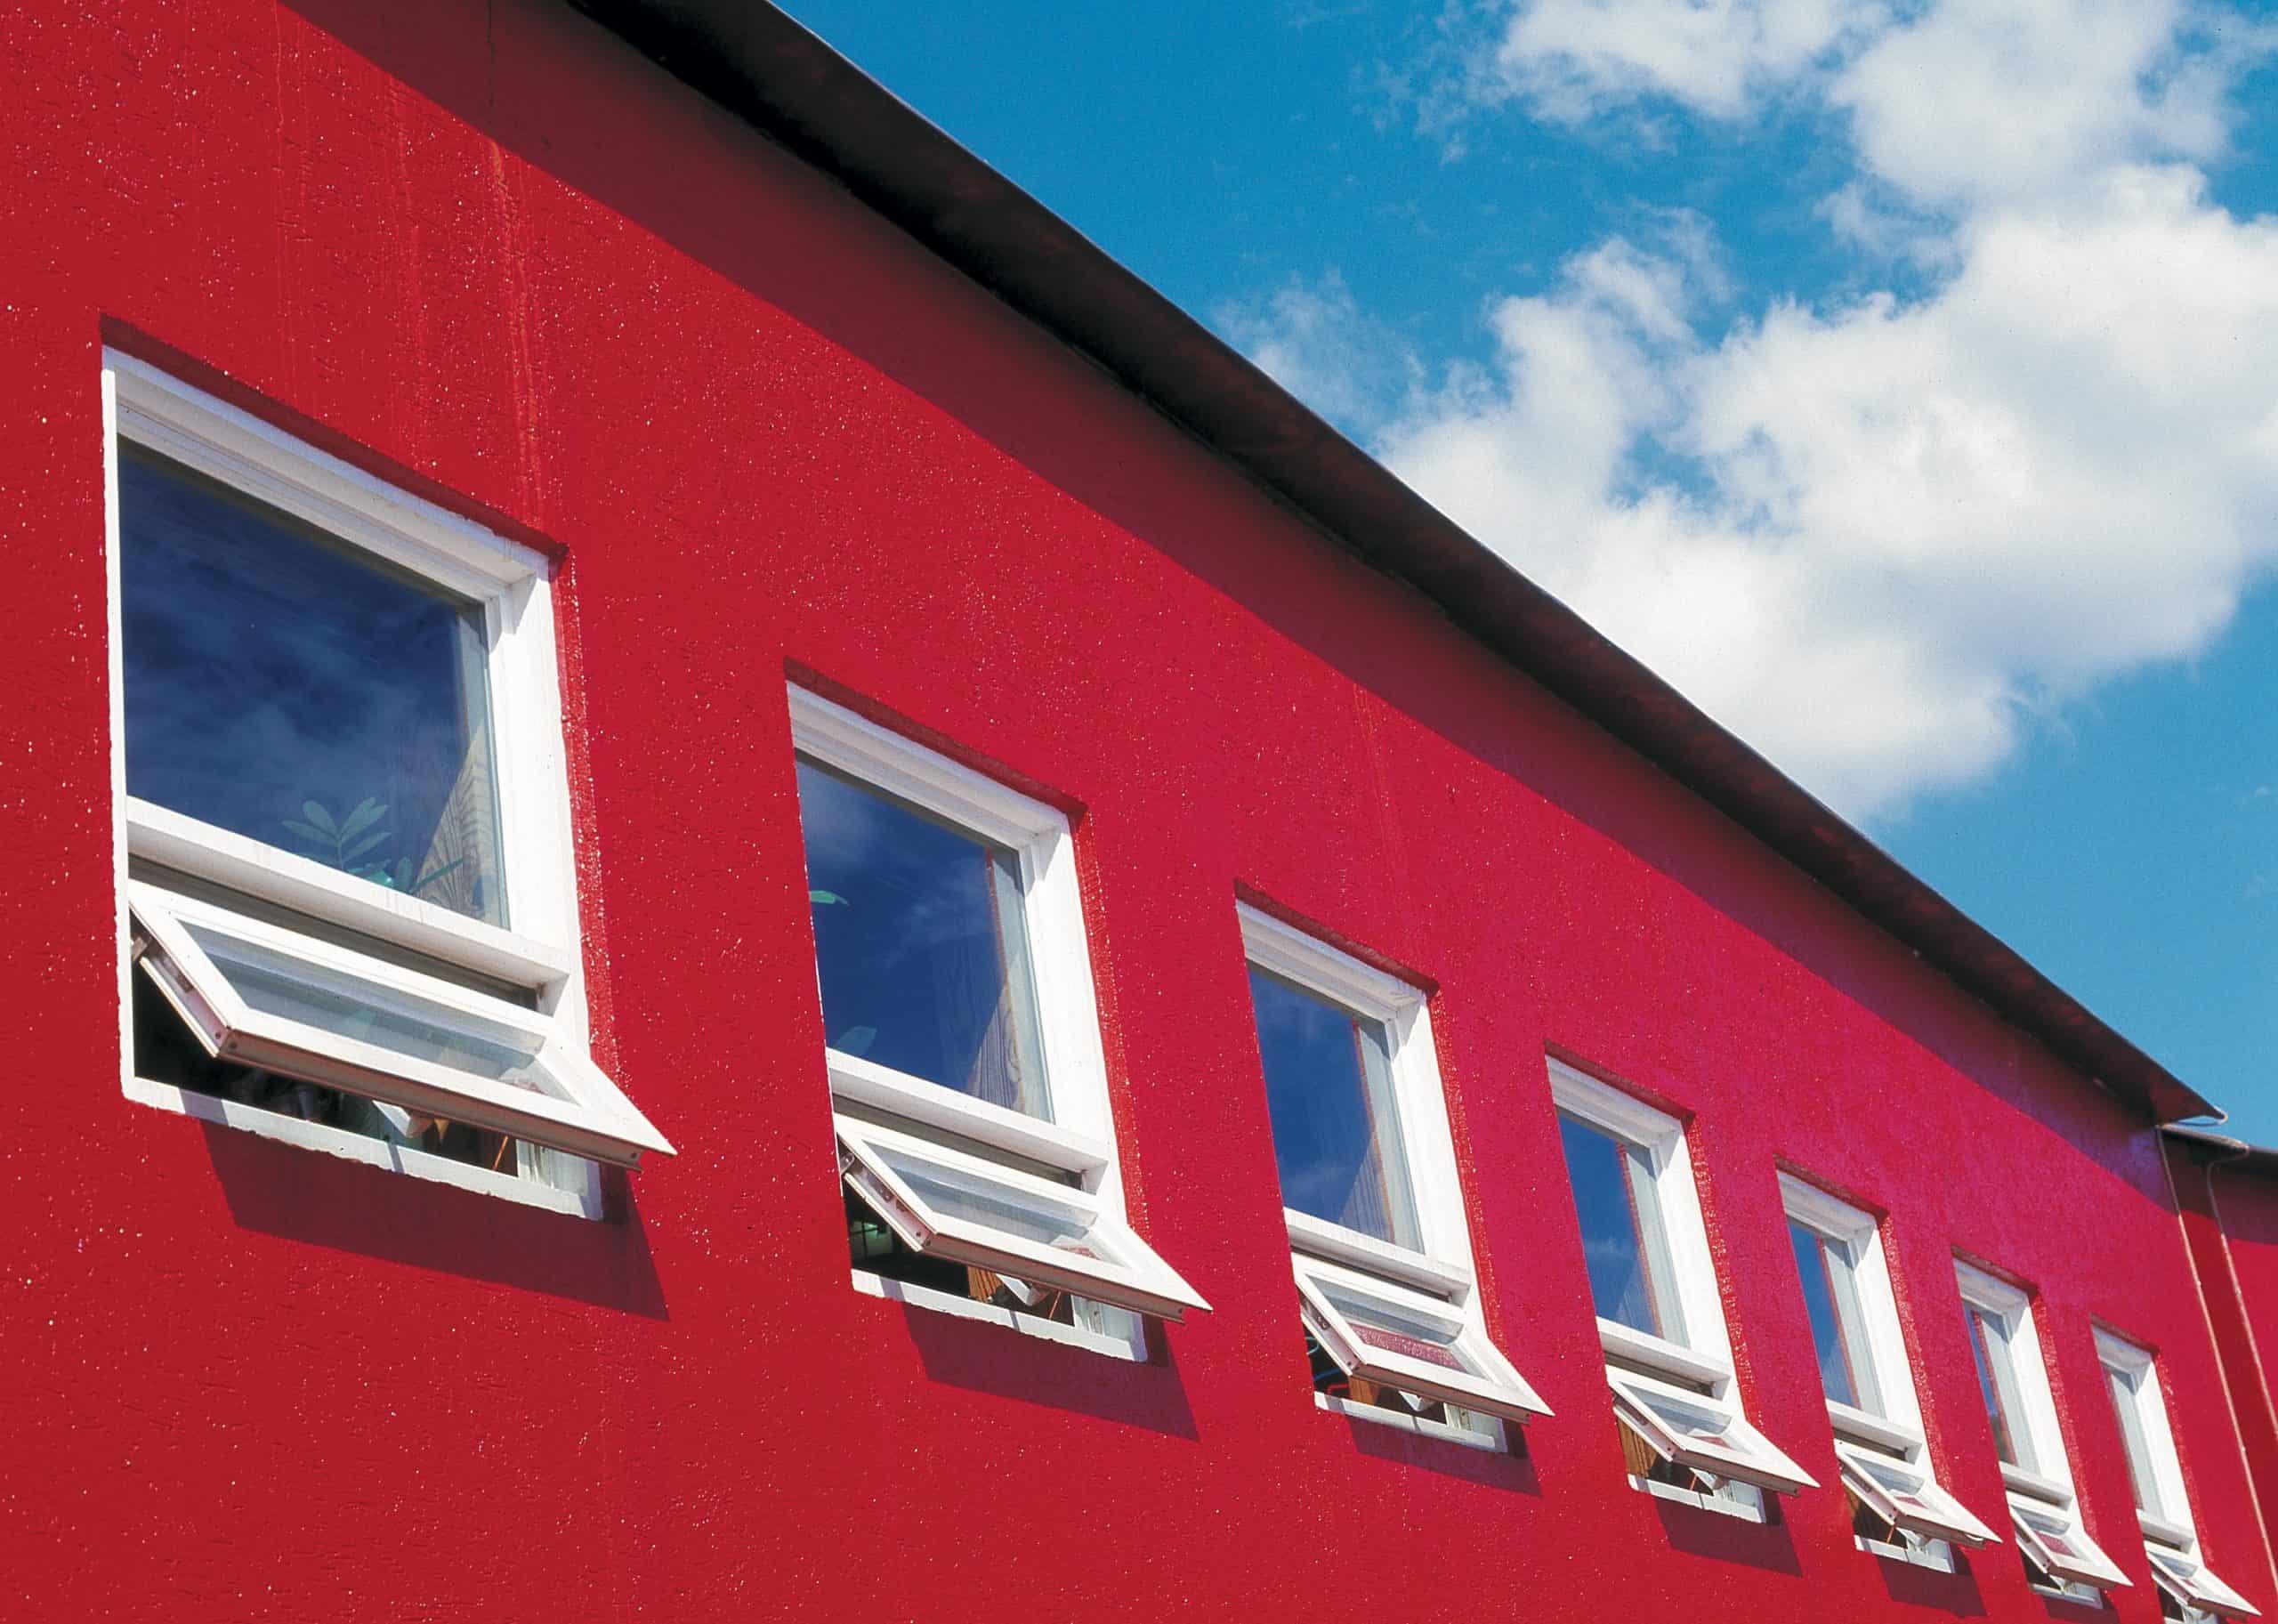 barn ventilation windows outside